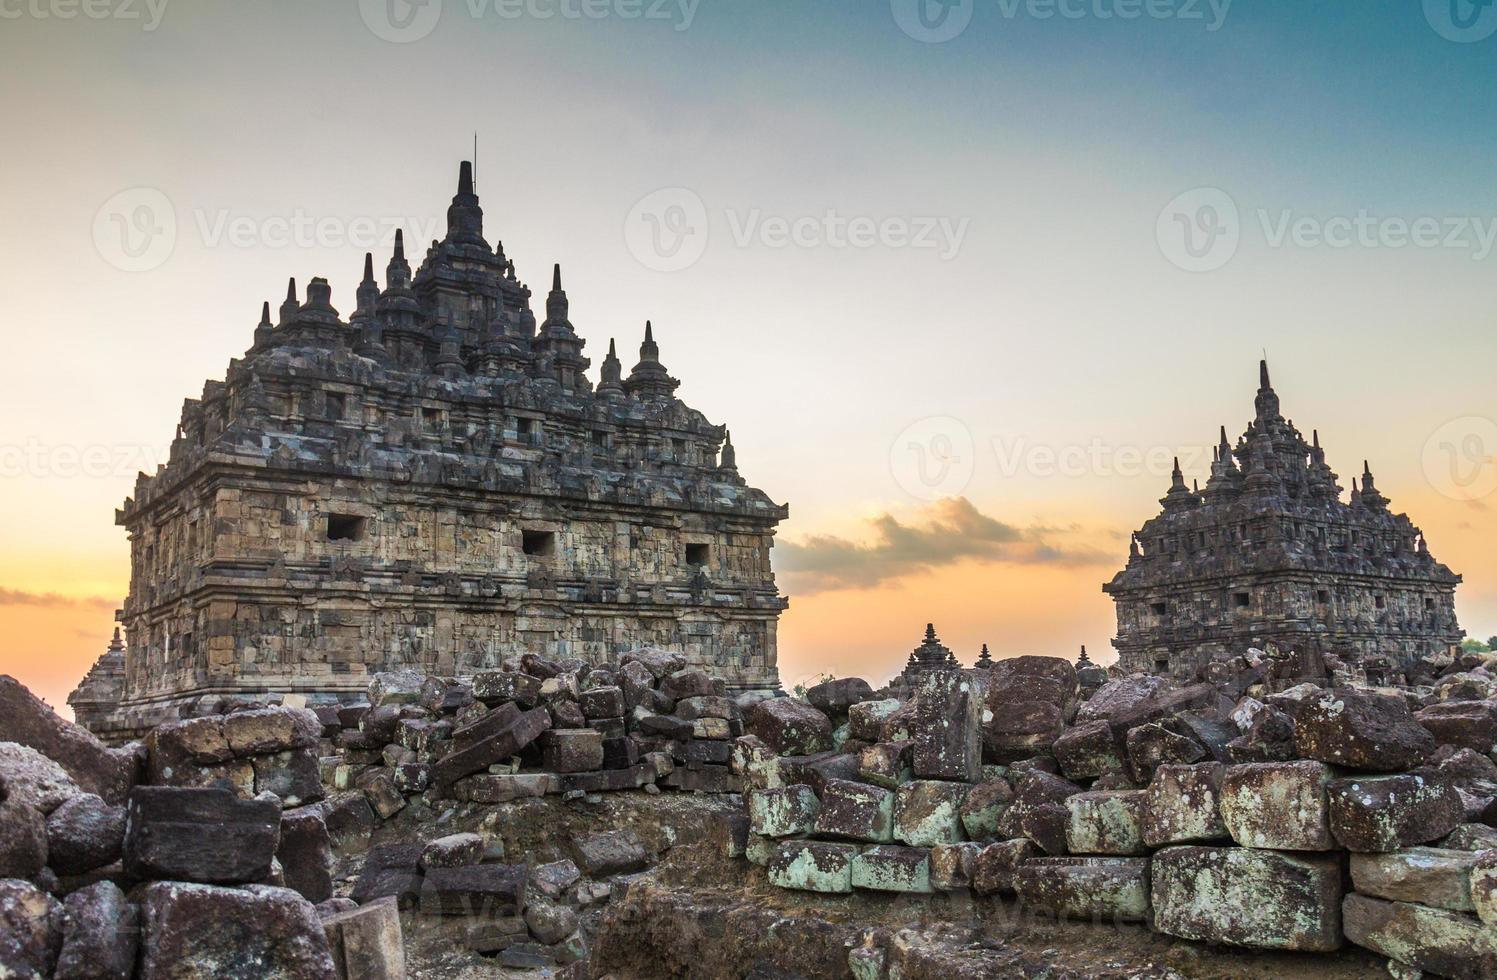 templo plaosan en java indonesia foto